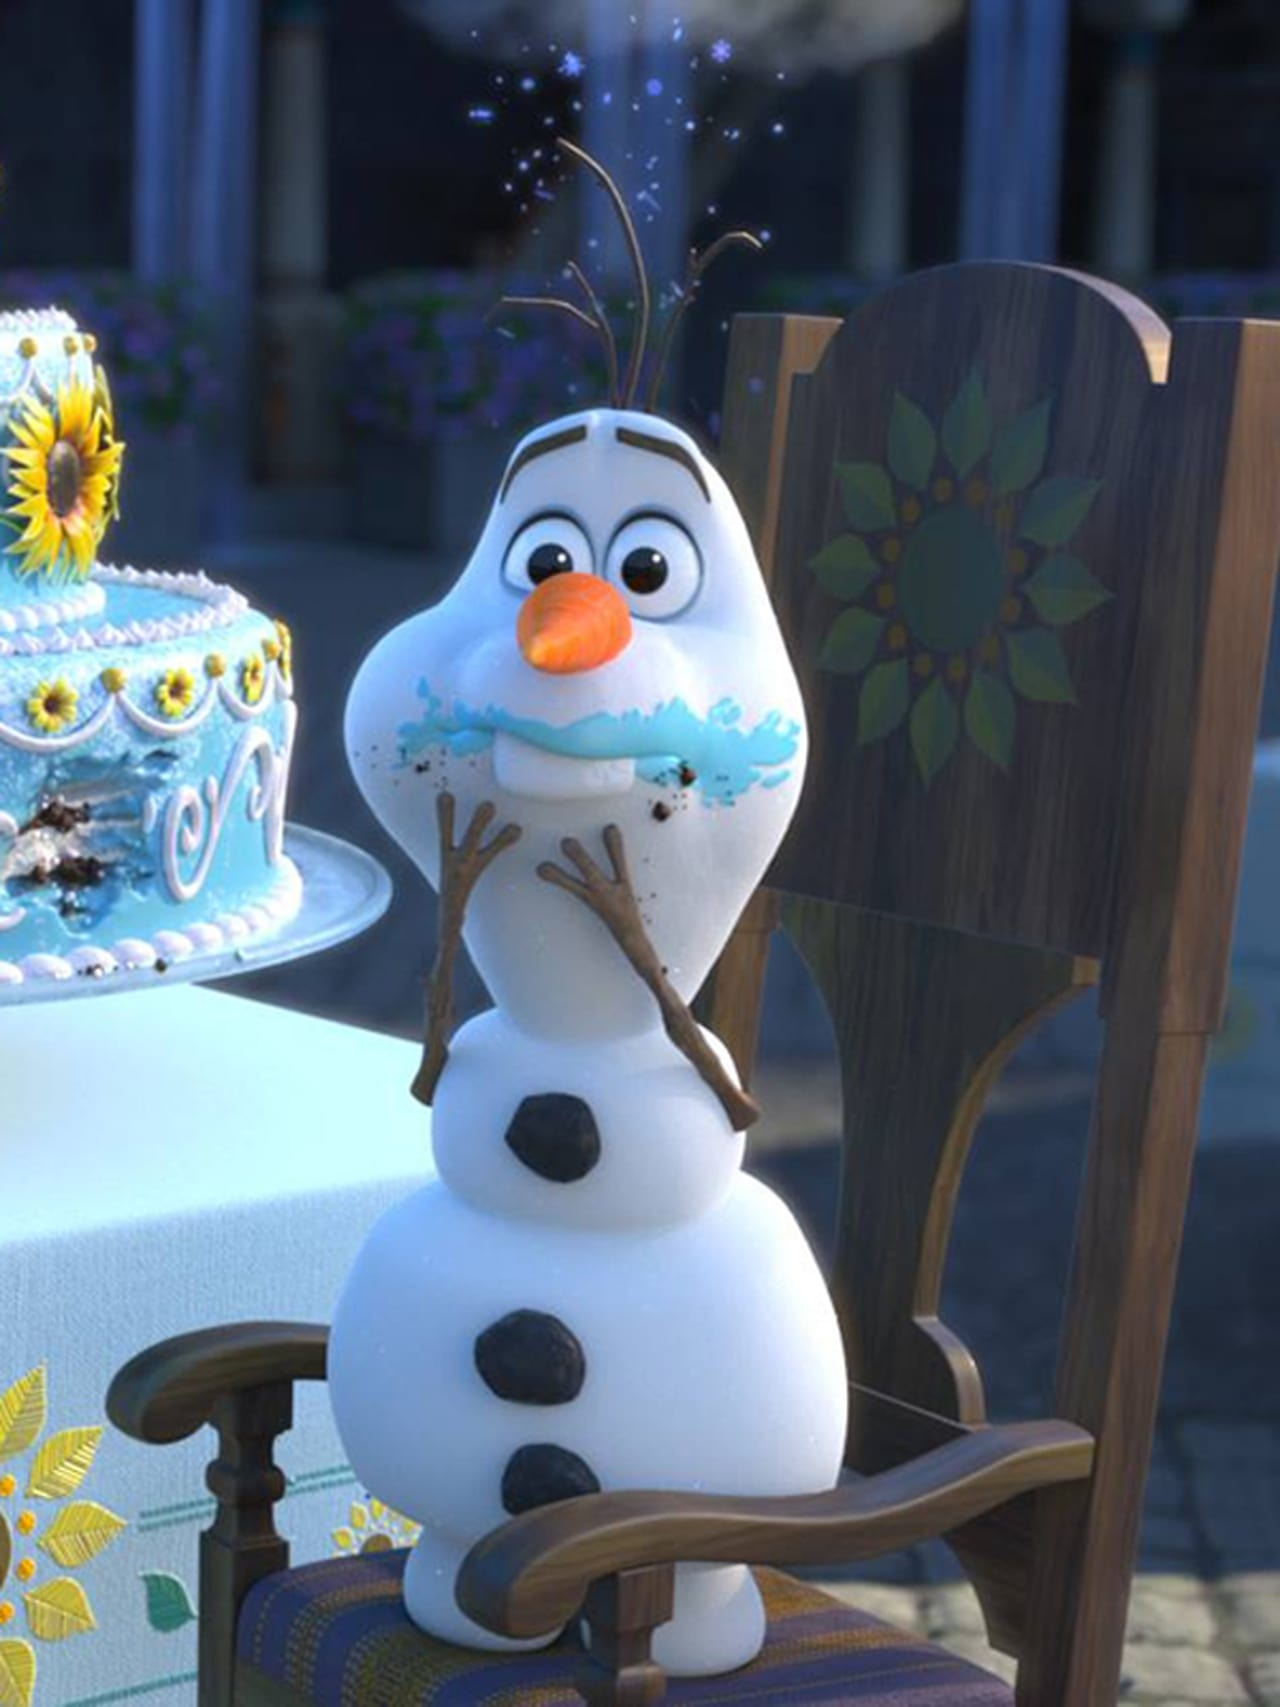 Frozen 2013 english subtitles srt - The citizen full movie